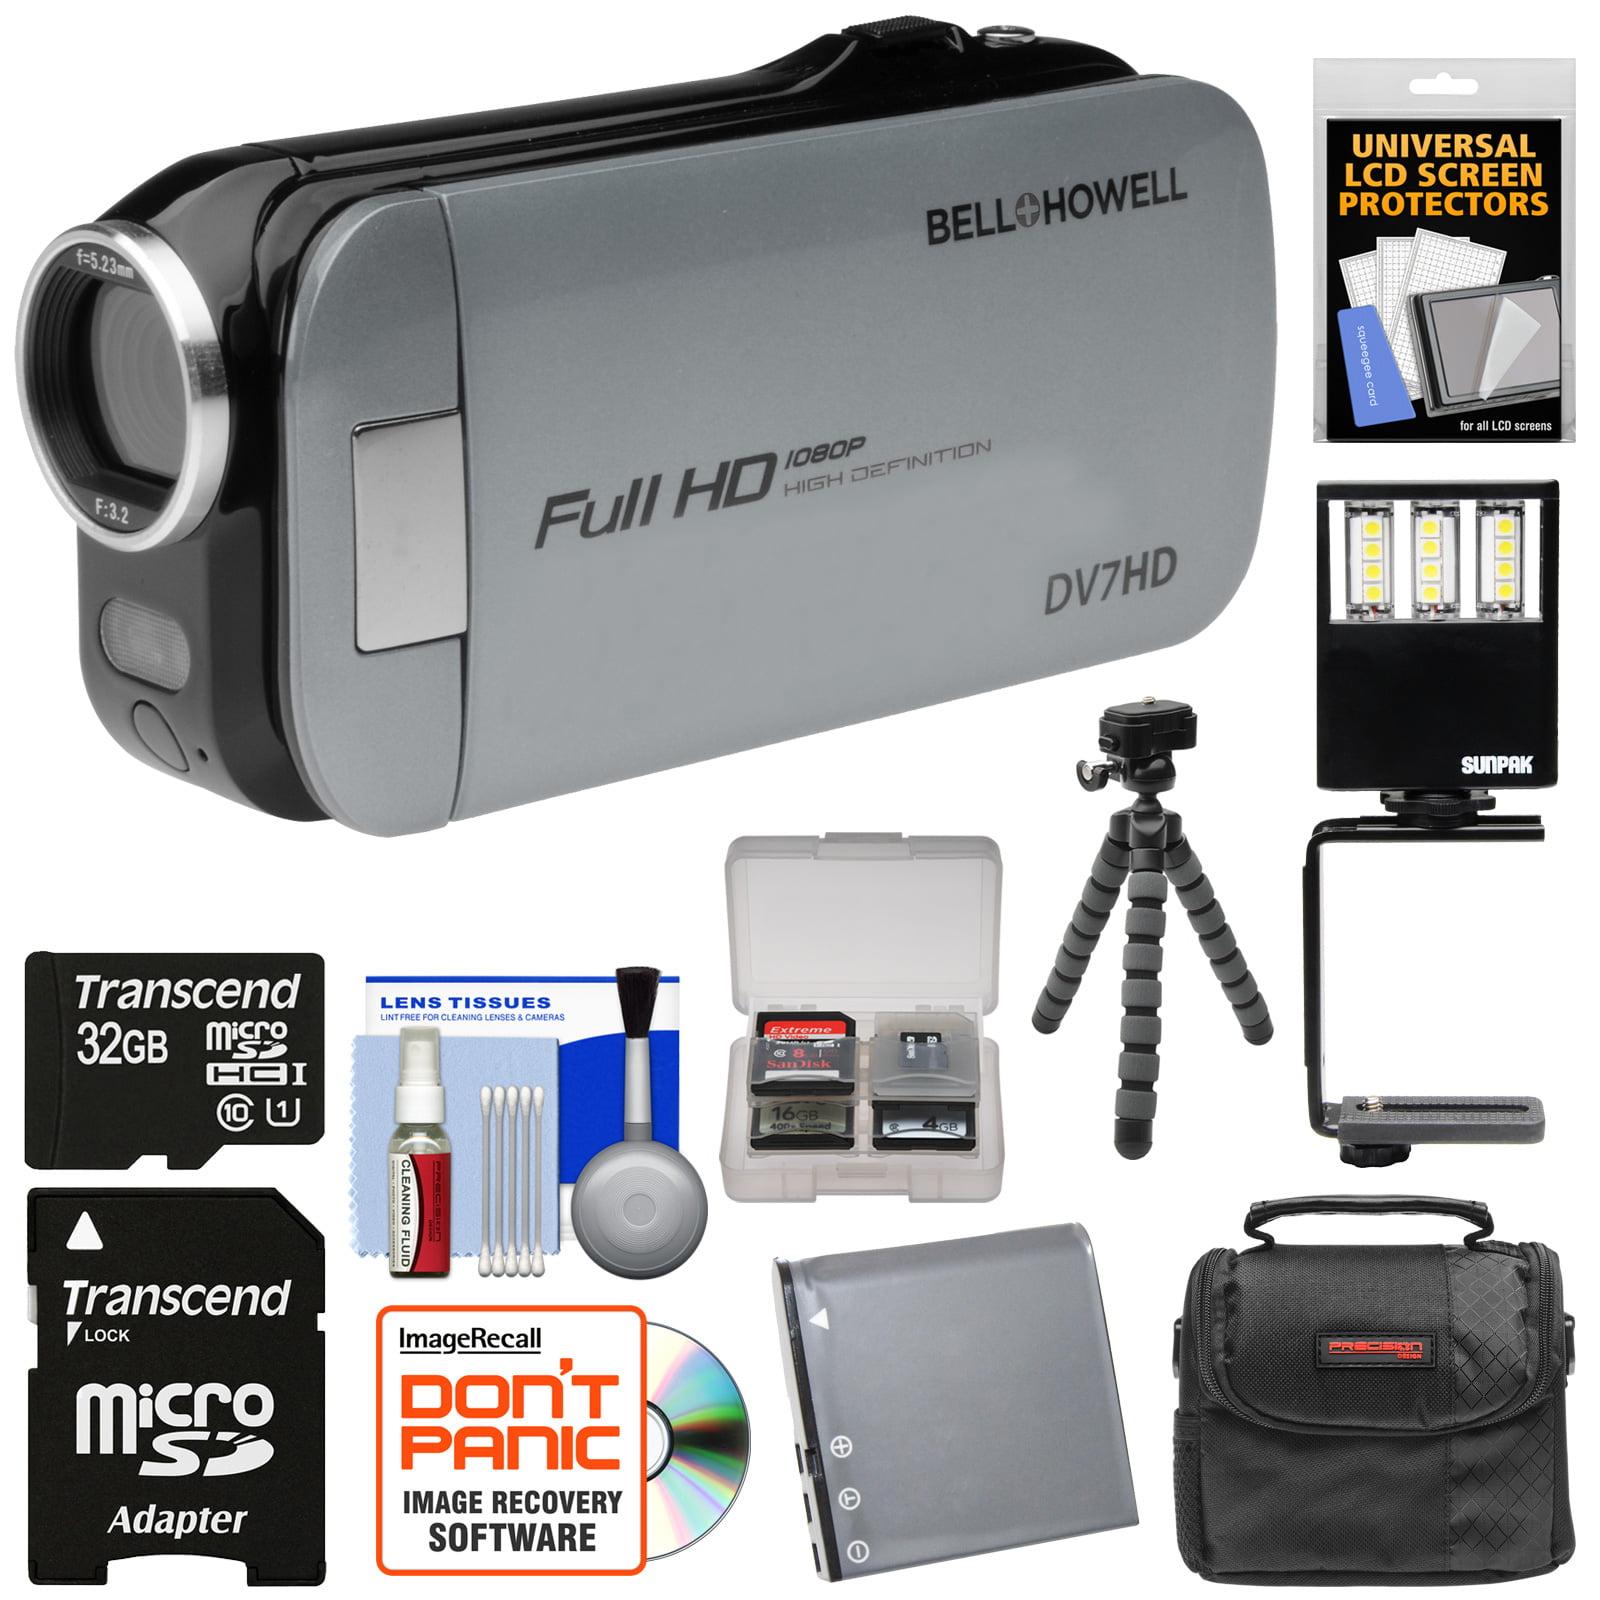 Bell & Howell Slice2 DV7HD 1080p HD Slim Video Camera Camcorder (Gray) with 32GB Card + Battery + Case + Flex Tripod + LED Video Light + Kit